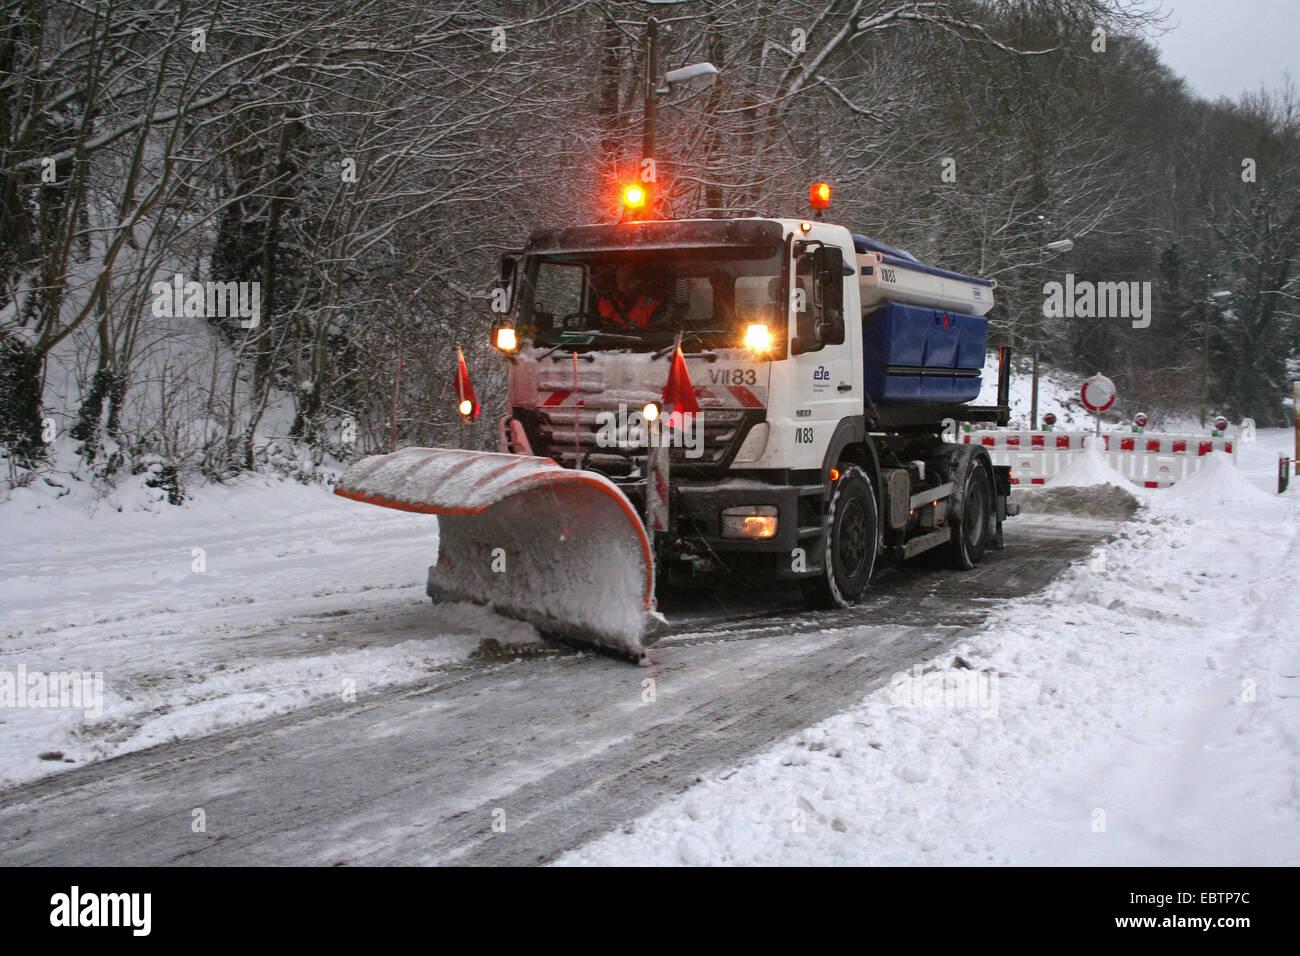 snowplow clearing the road, Germany, North Rhine-Westphalia - Stock Image